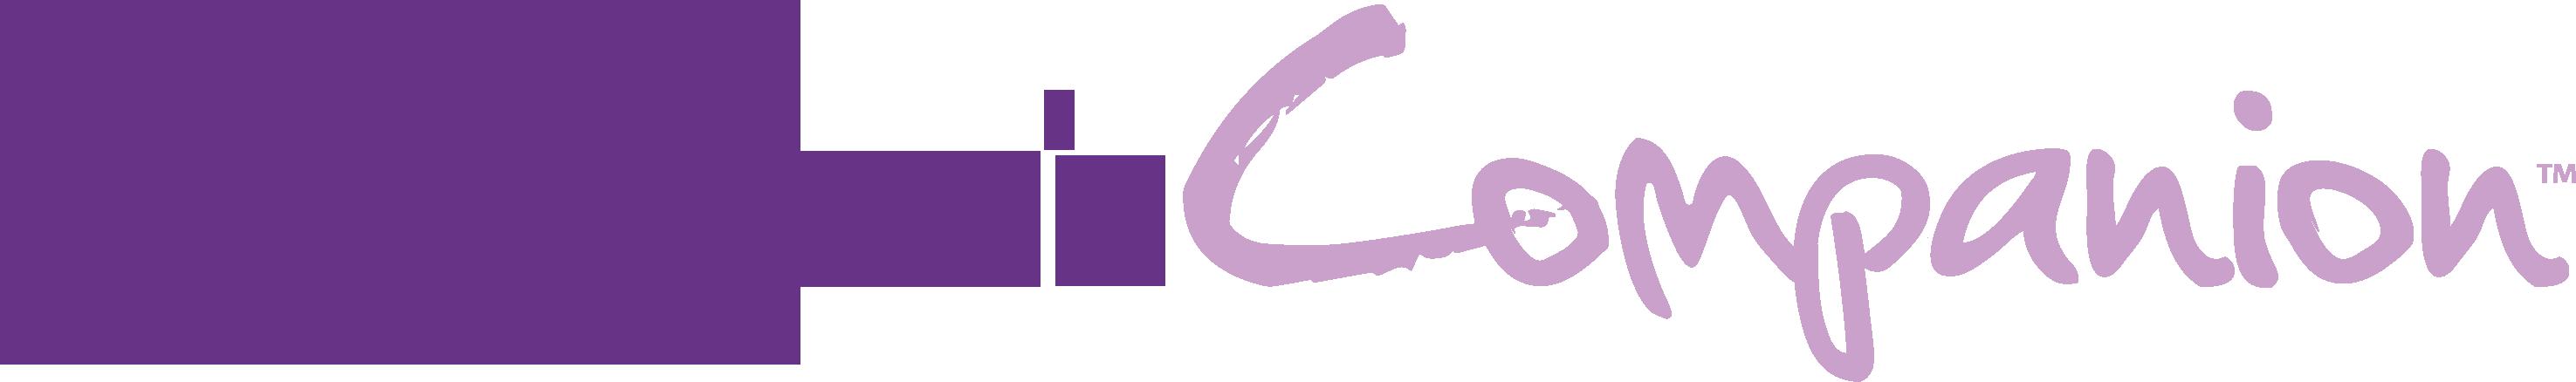 original-cc-logo-twopurple.png